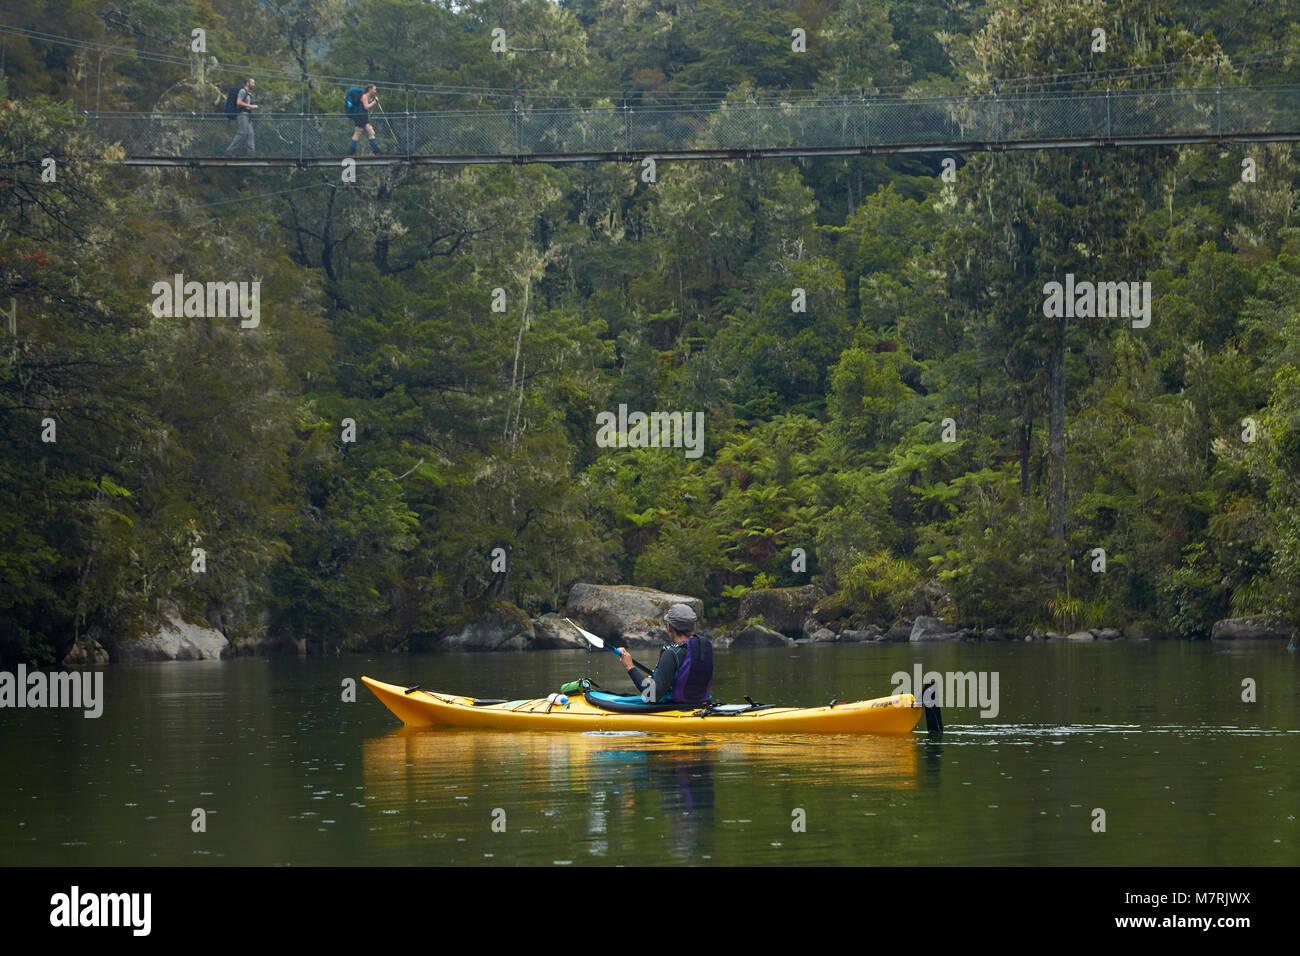 Swingbridge and kayak, Sandfly Bay Lagoon, Abel Tasman National Park, Nelson Region, South Island, New Zealand - Stock Image